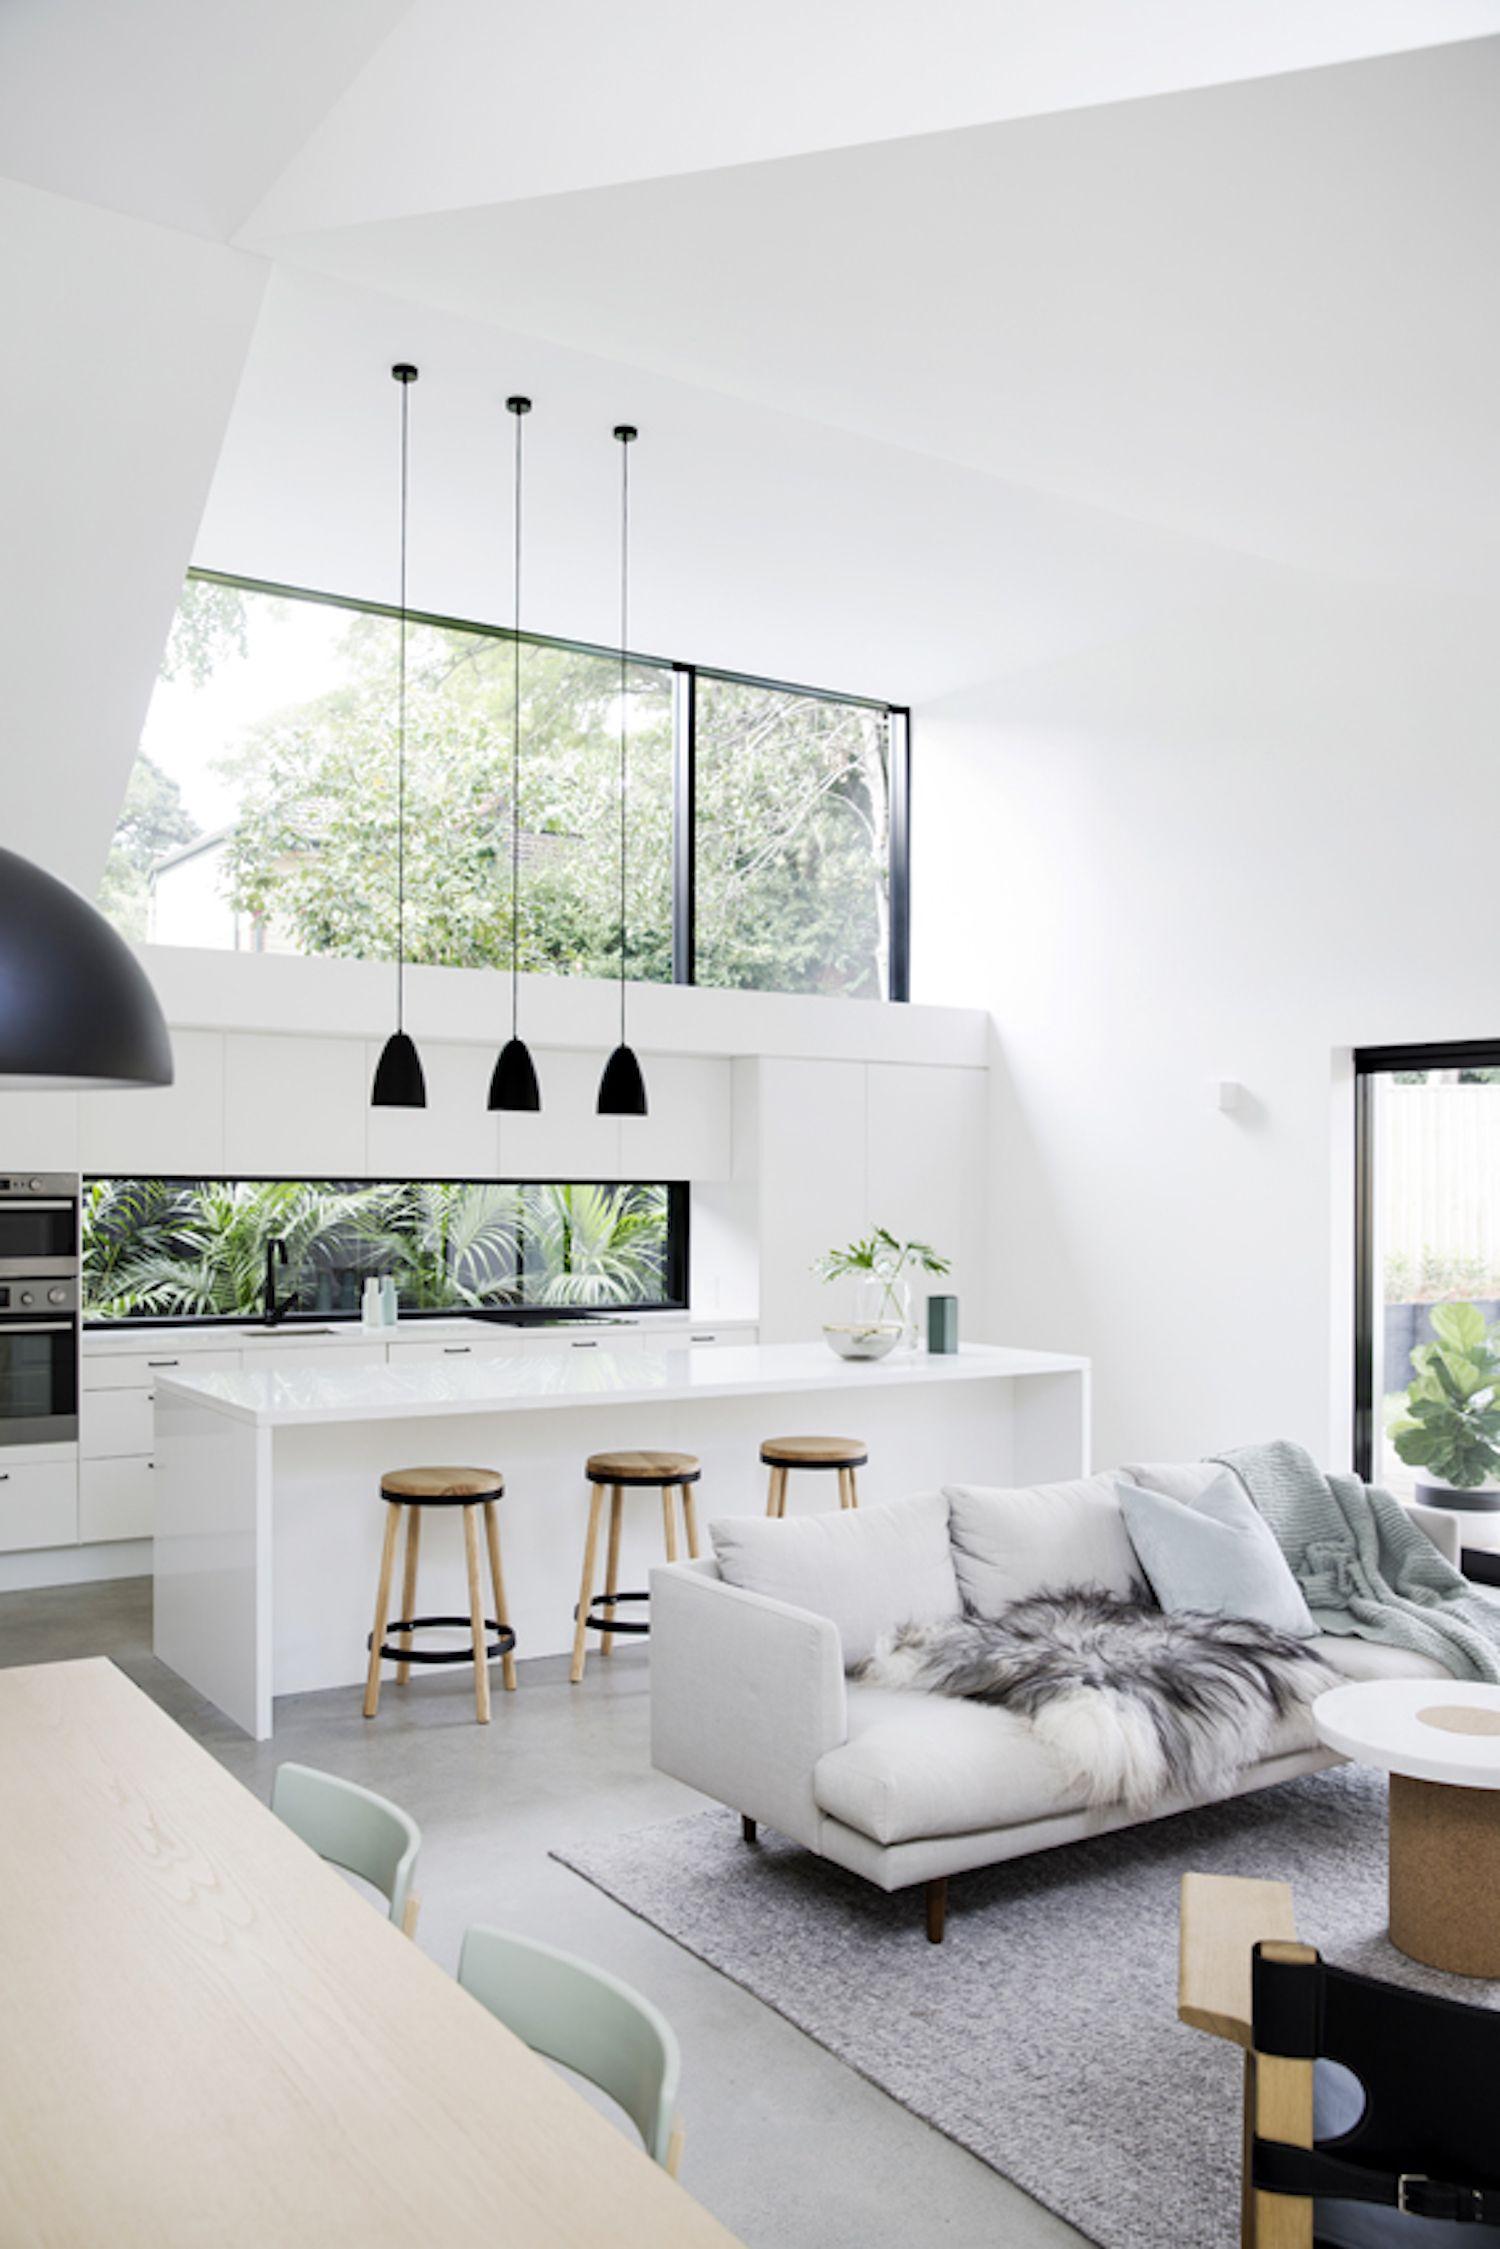 small house interior design allen key house by architect prineas | est living MFIJJER